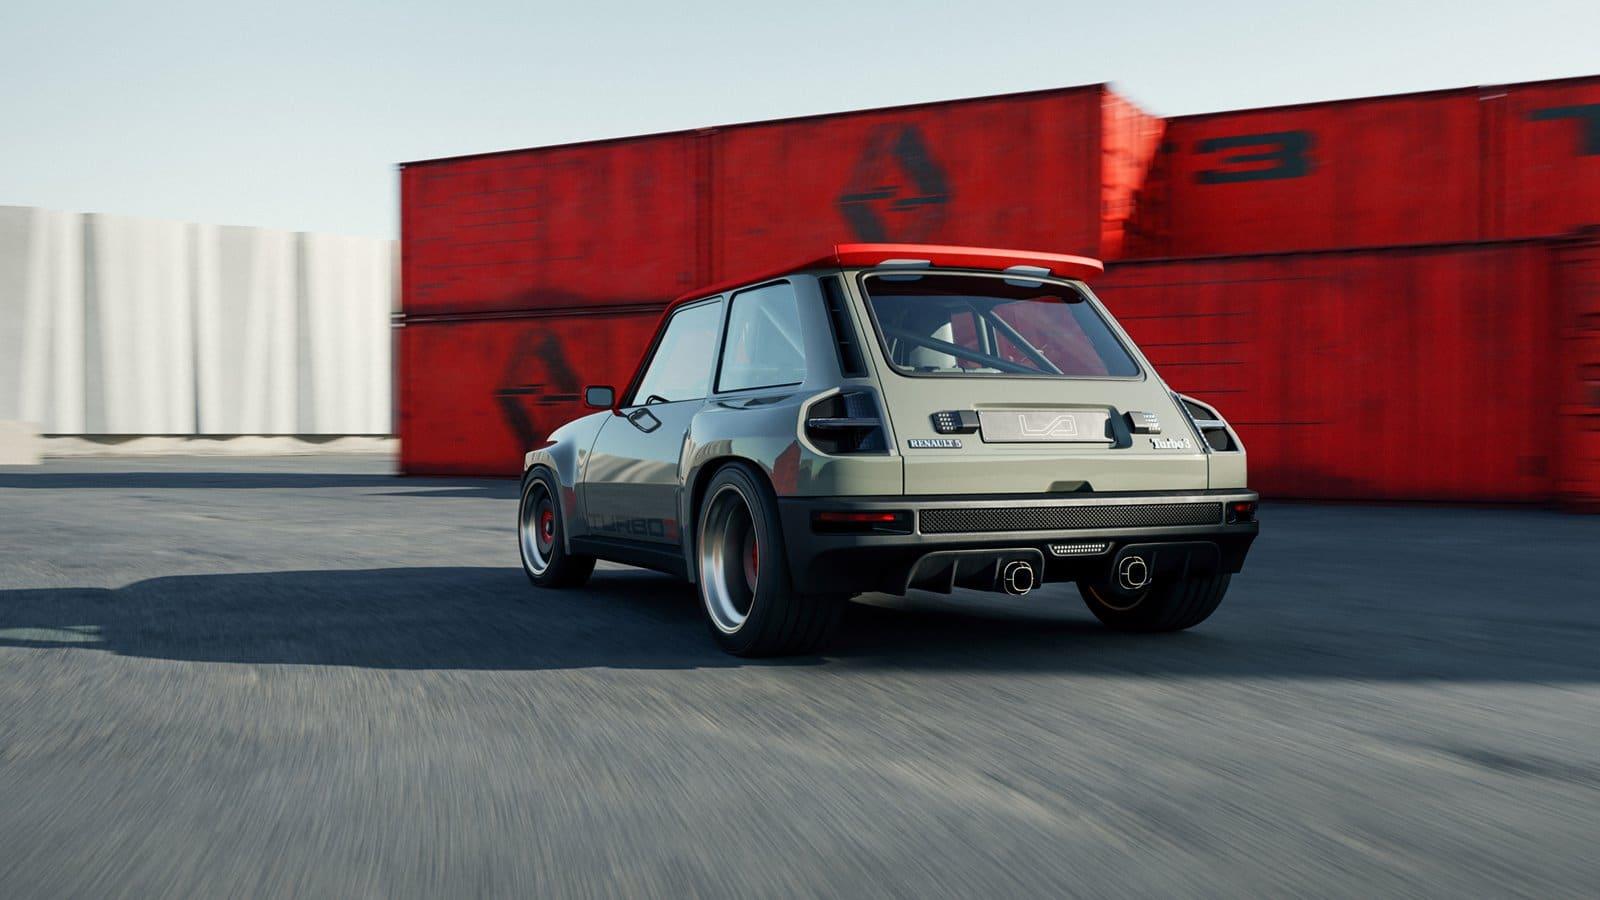 Renault 5 Turbo 3 trasera